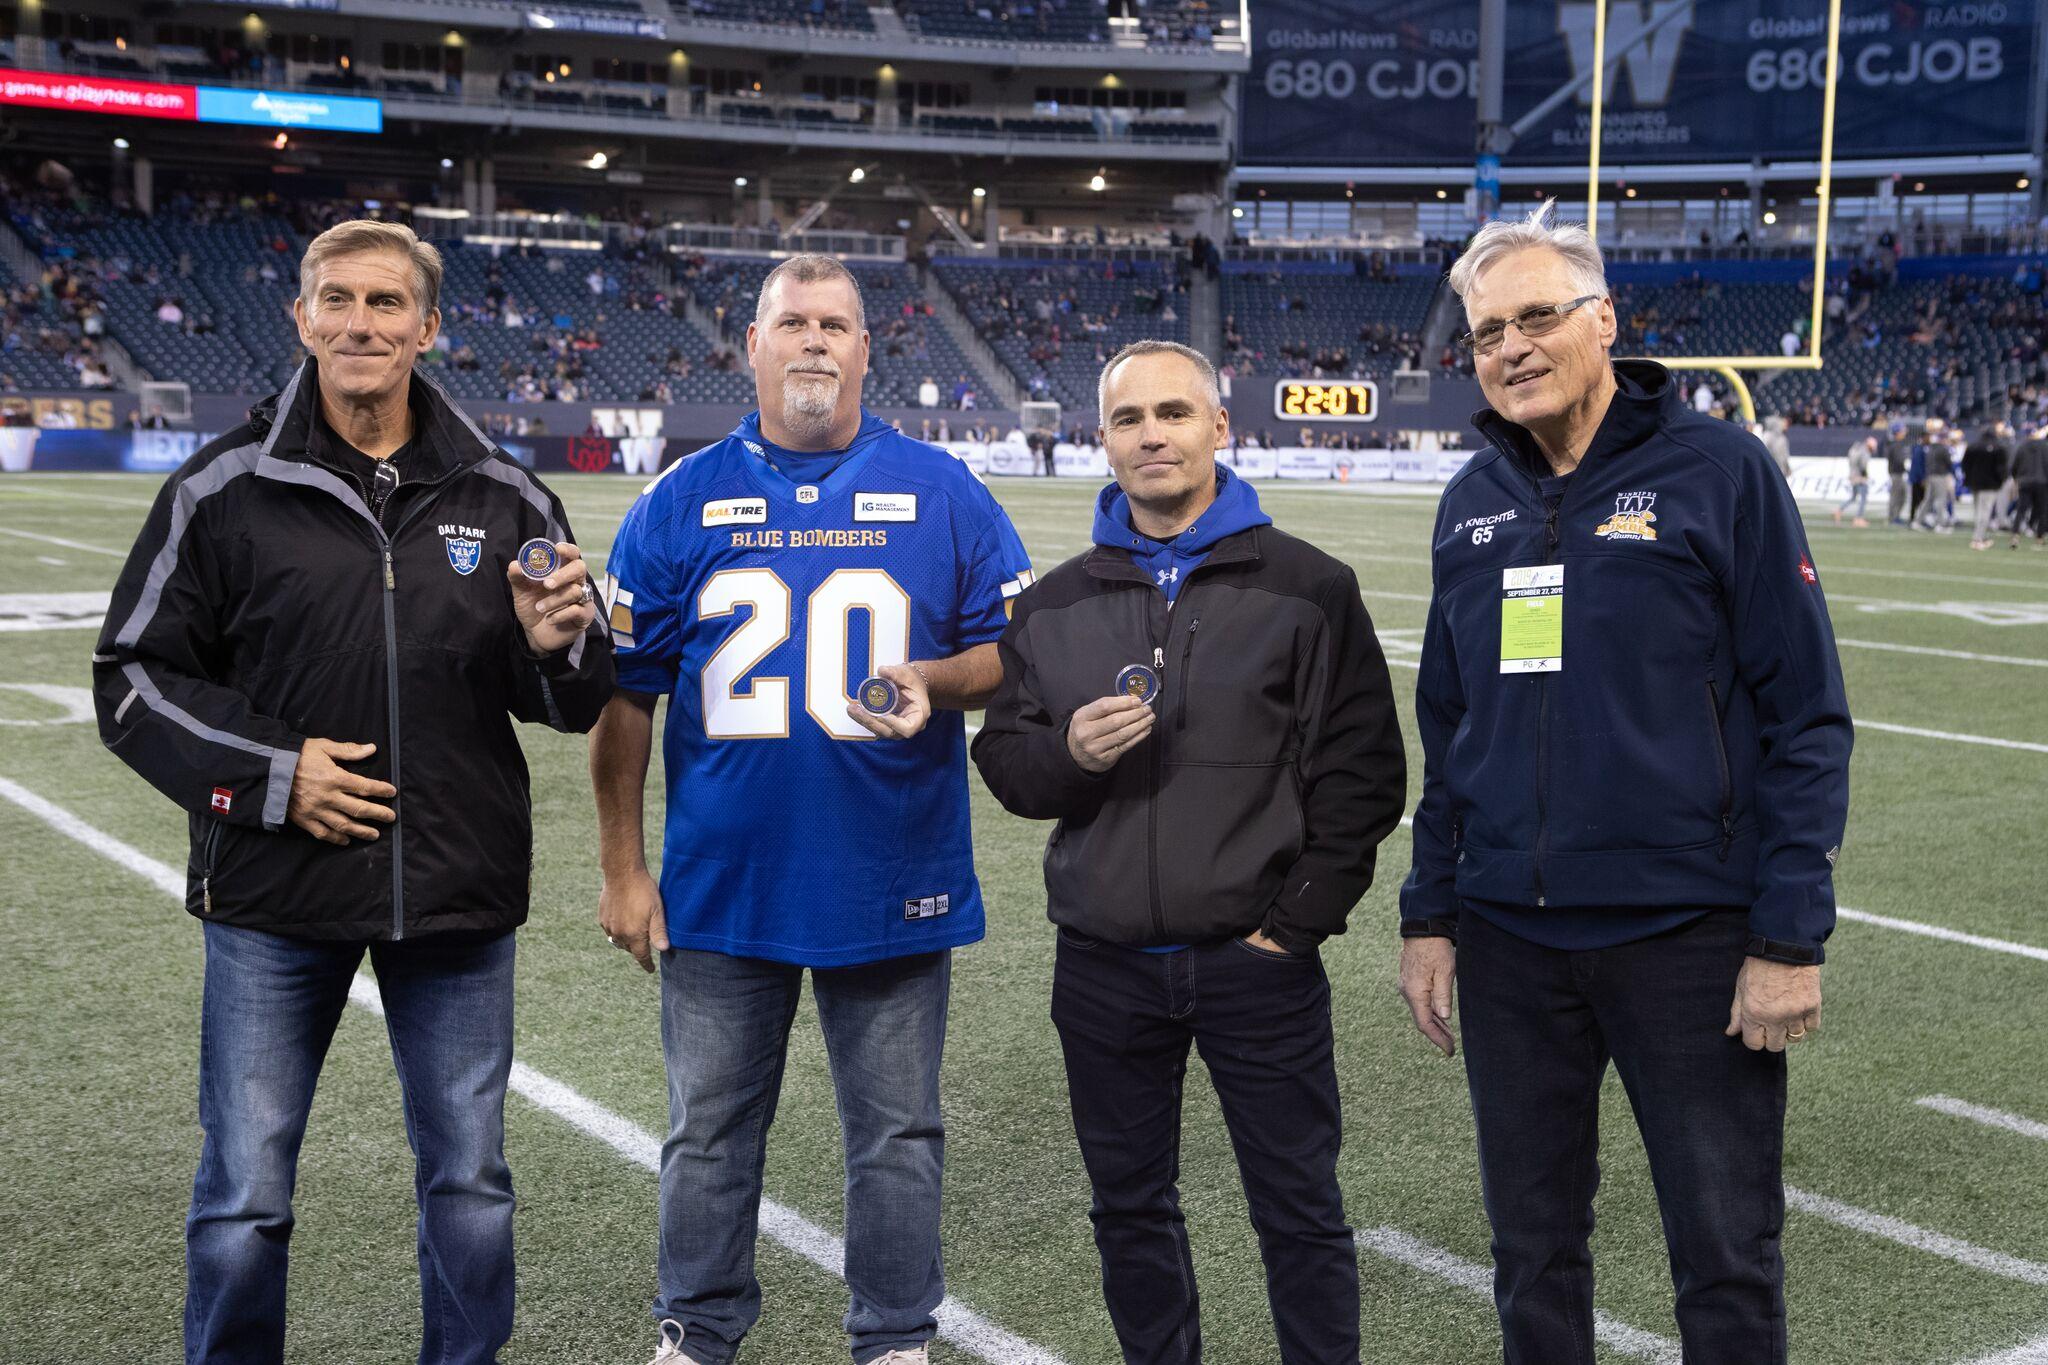 Sept 27, 2019 Community Hero = Dave Knechtel, Stu Nixon, Nathan Yamron, Brett Watt